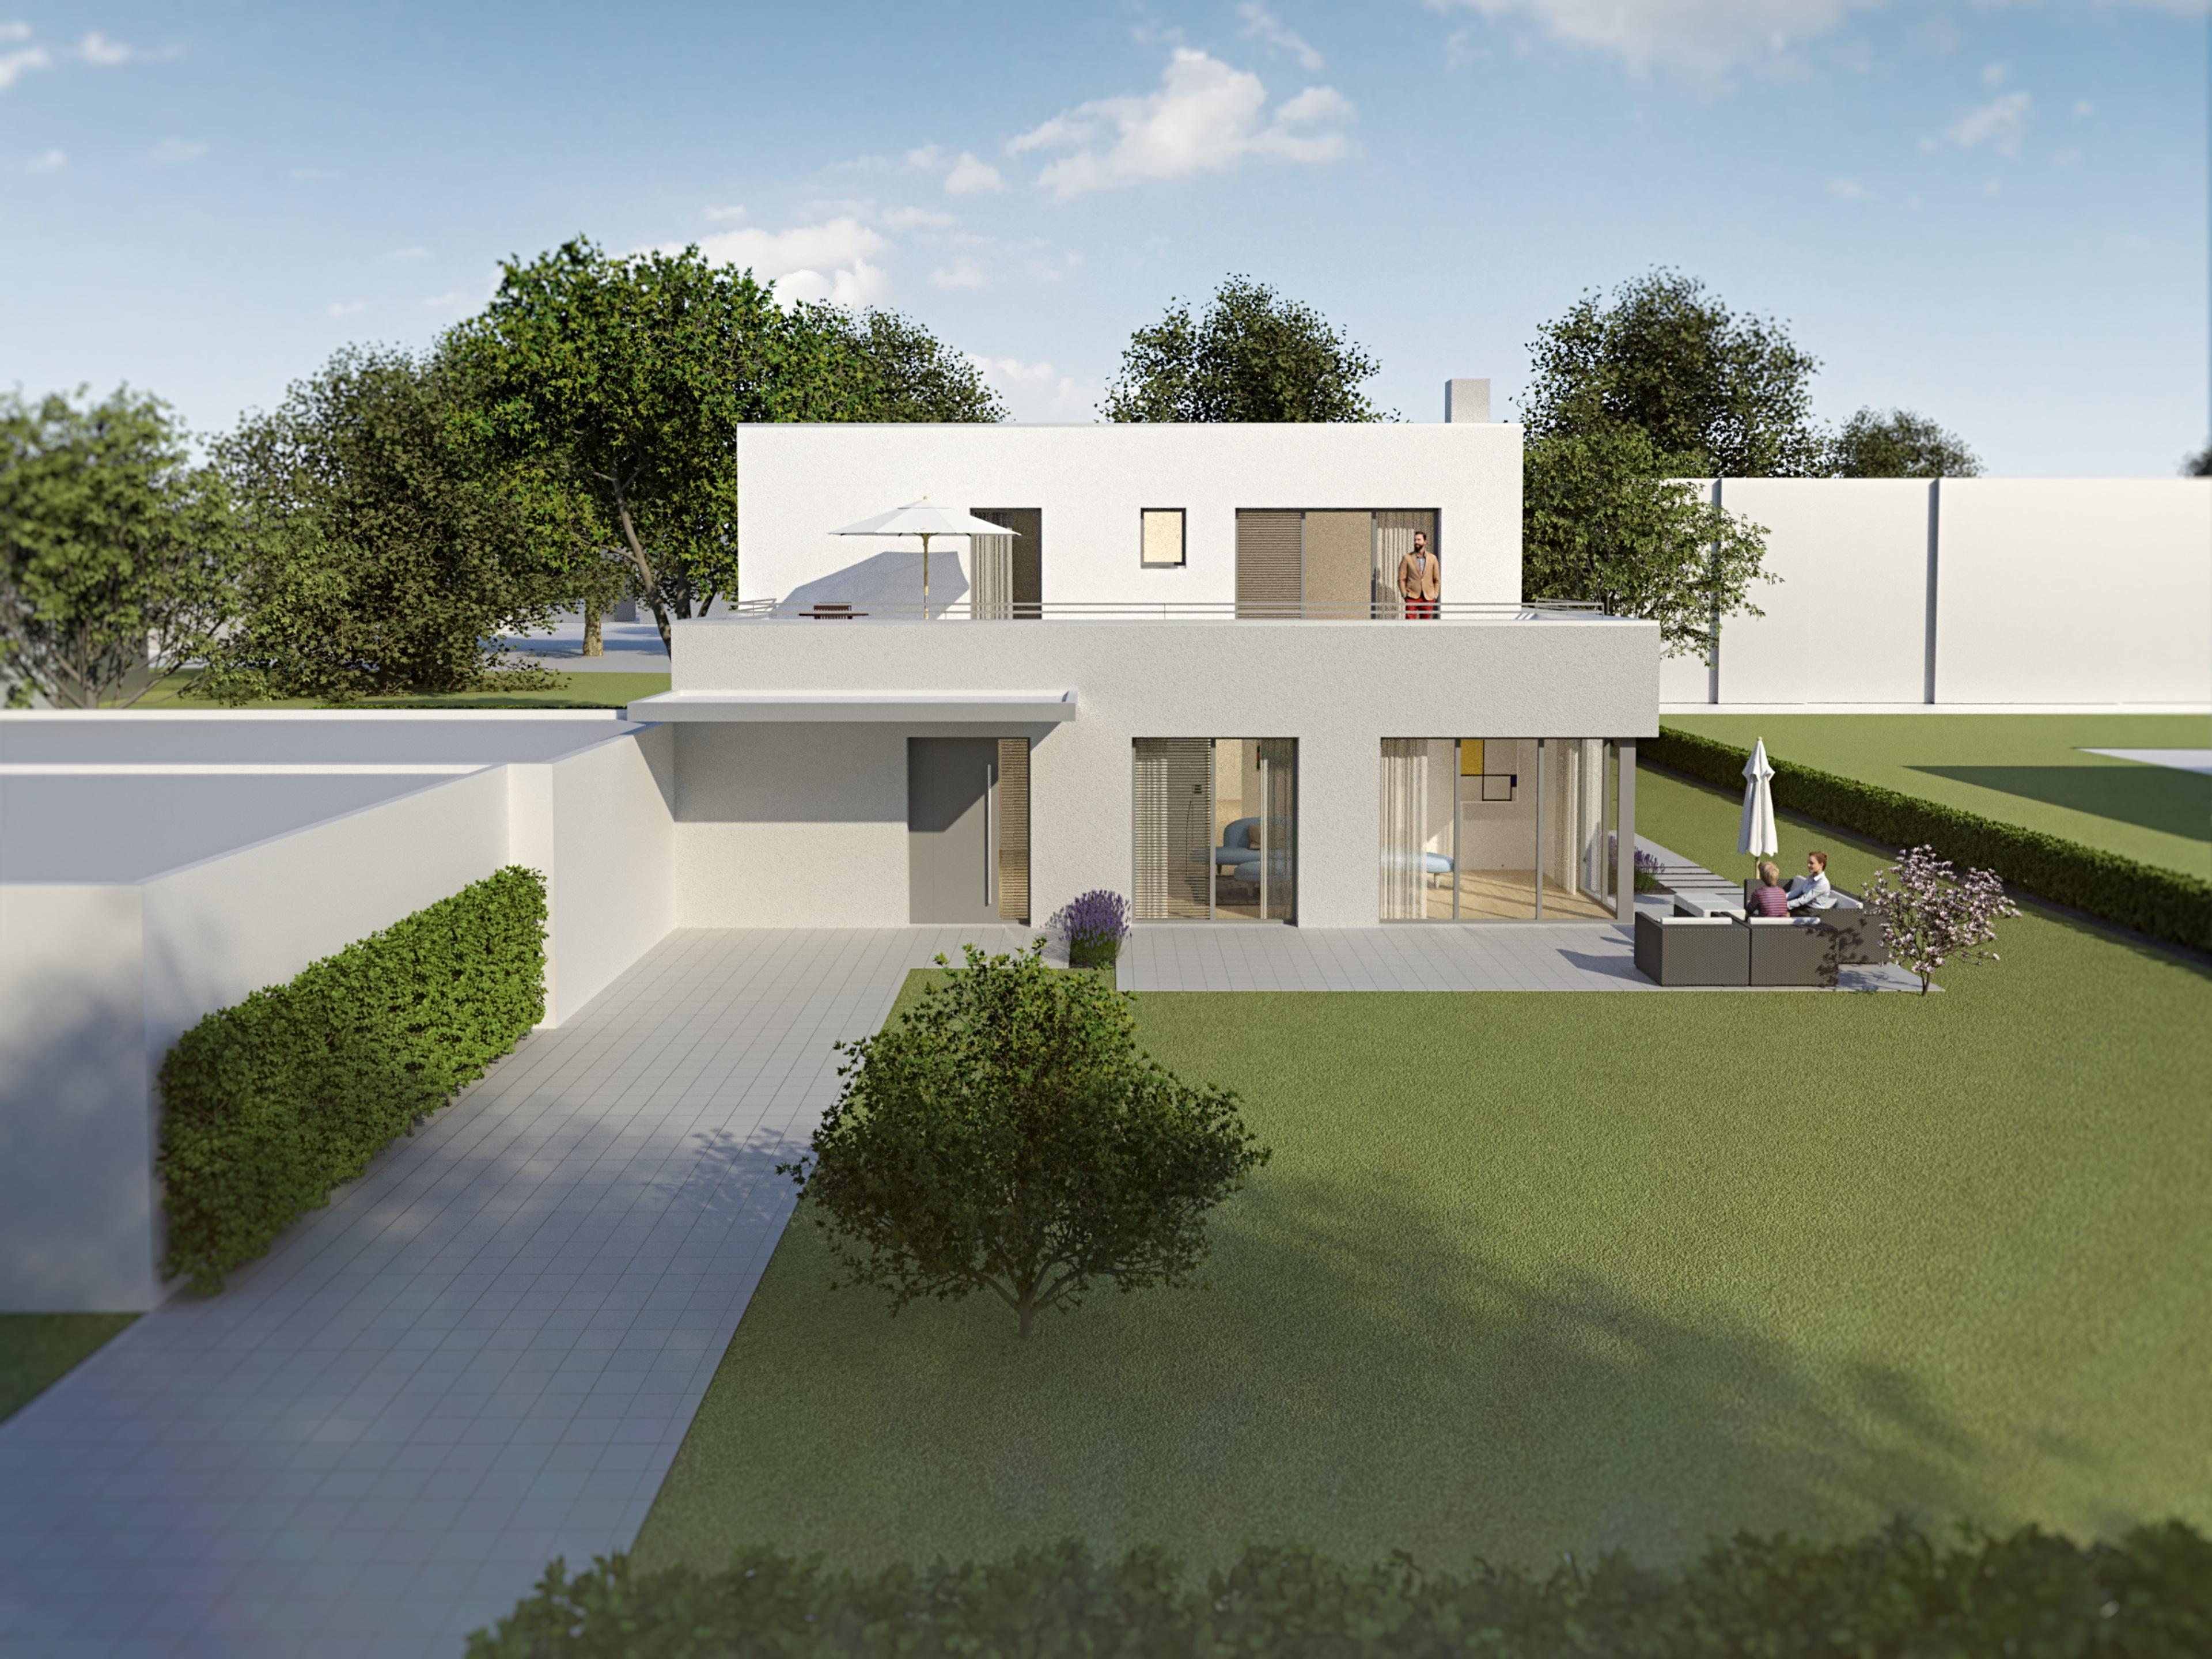 Einfamilienhaus Architekturbuero